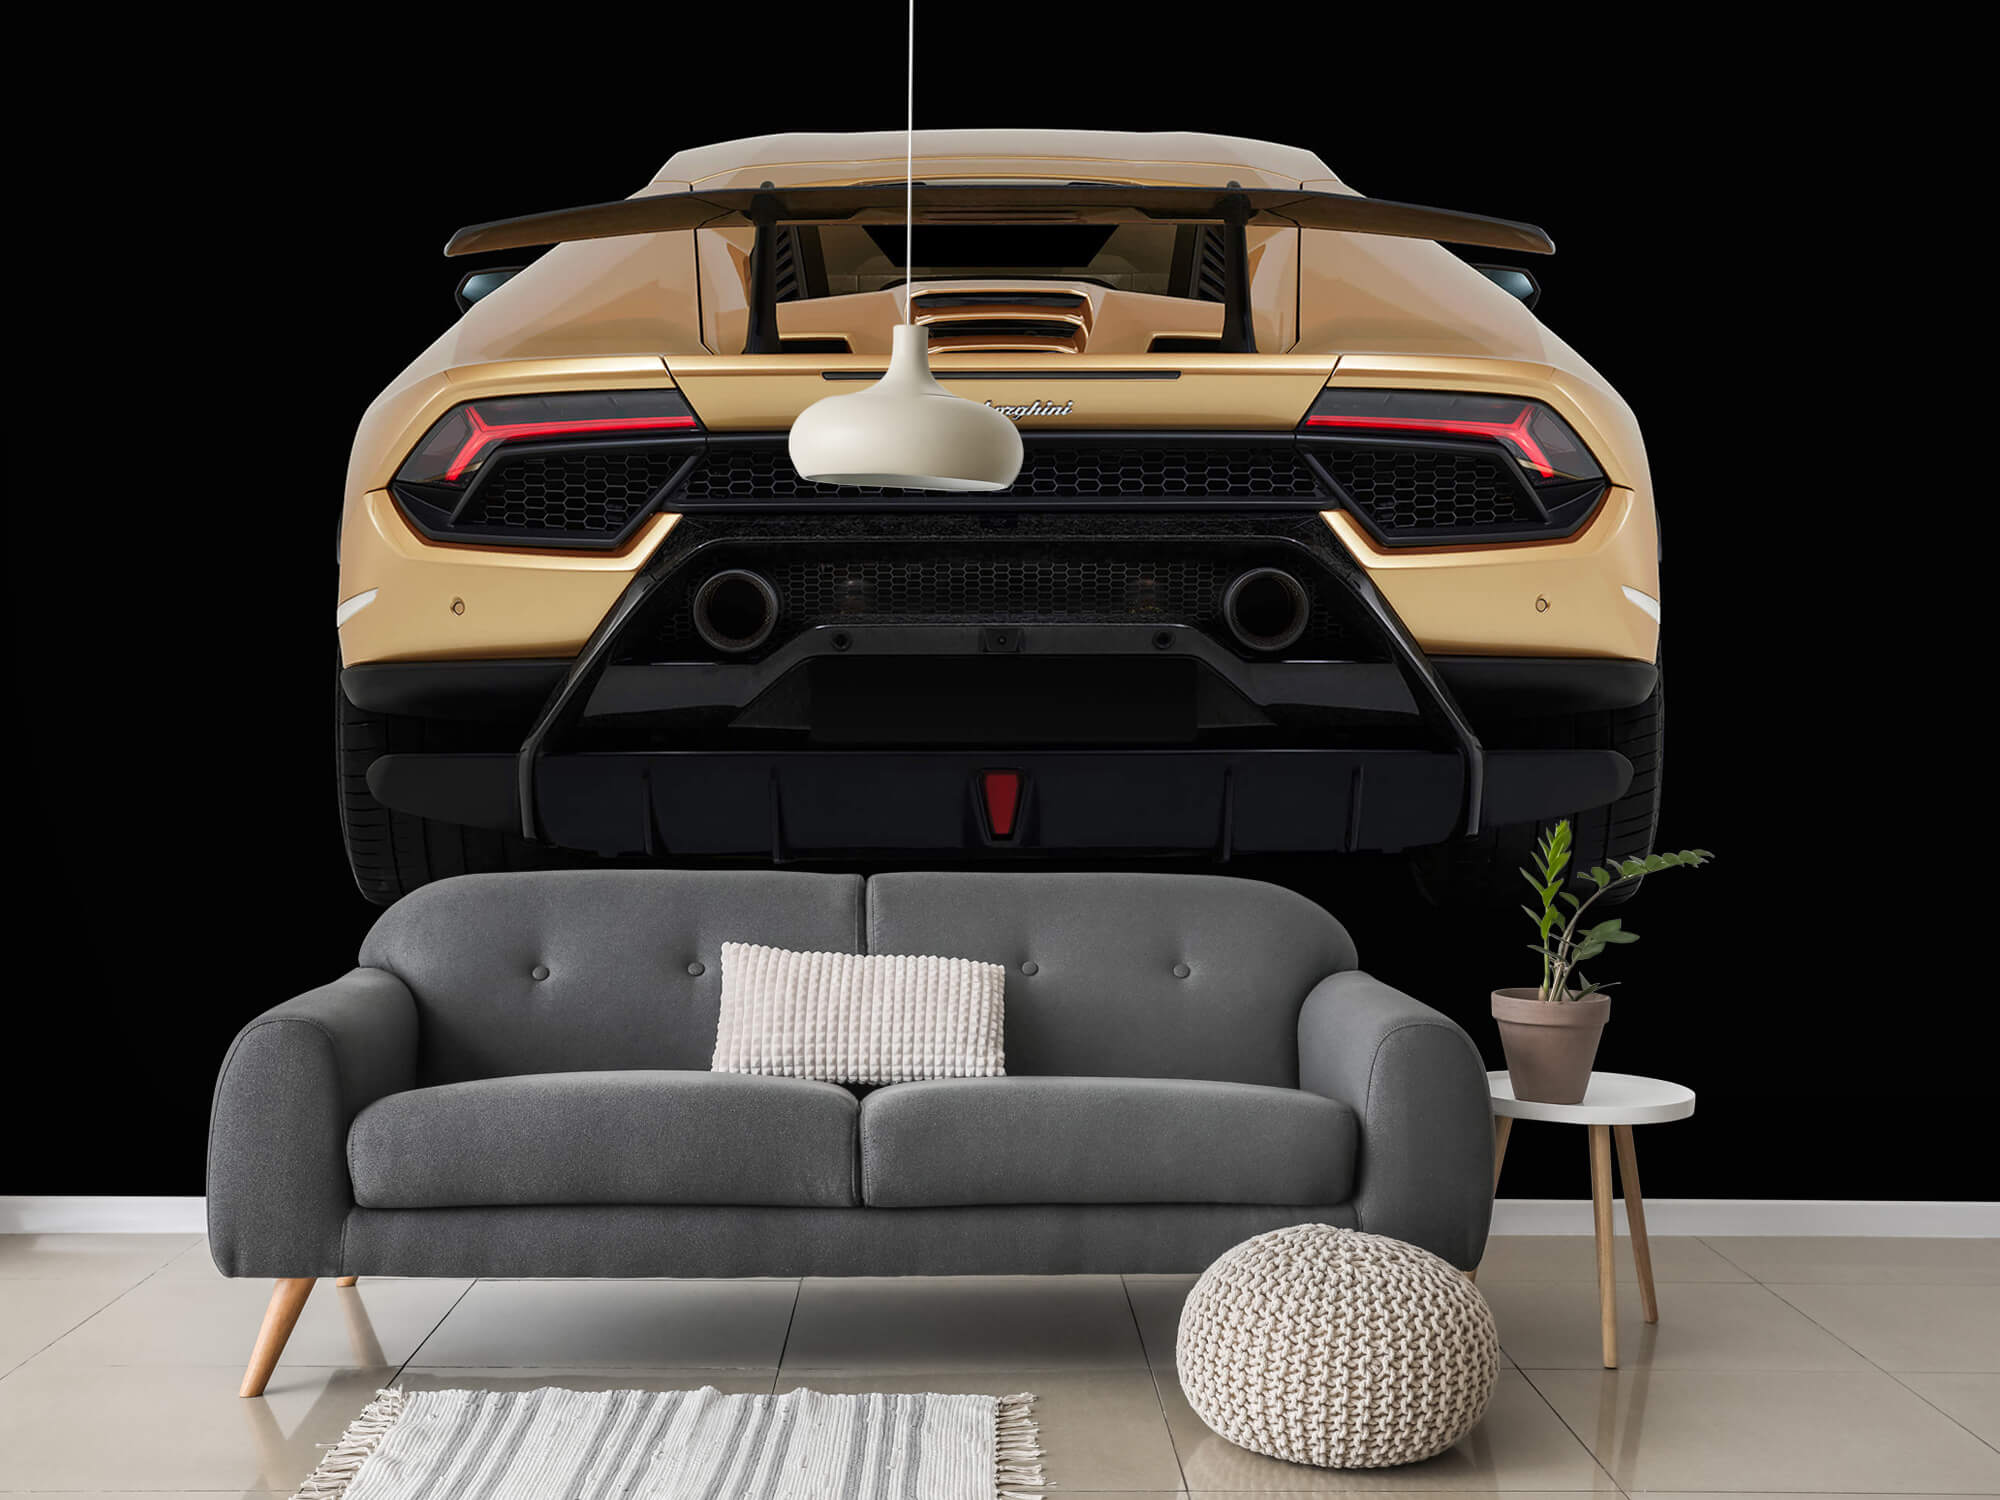 Wallpaper Lamborghini Huracán - Rear view, black 15